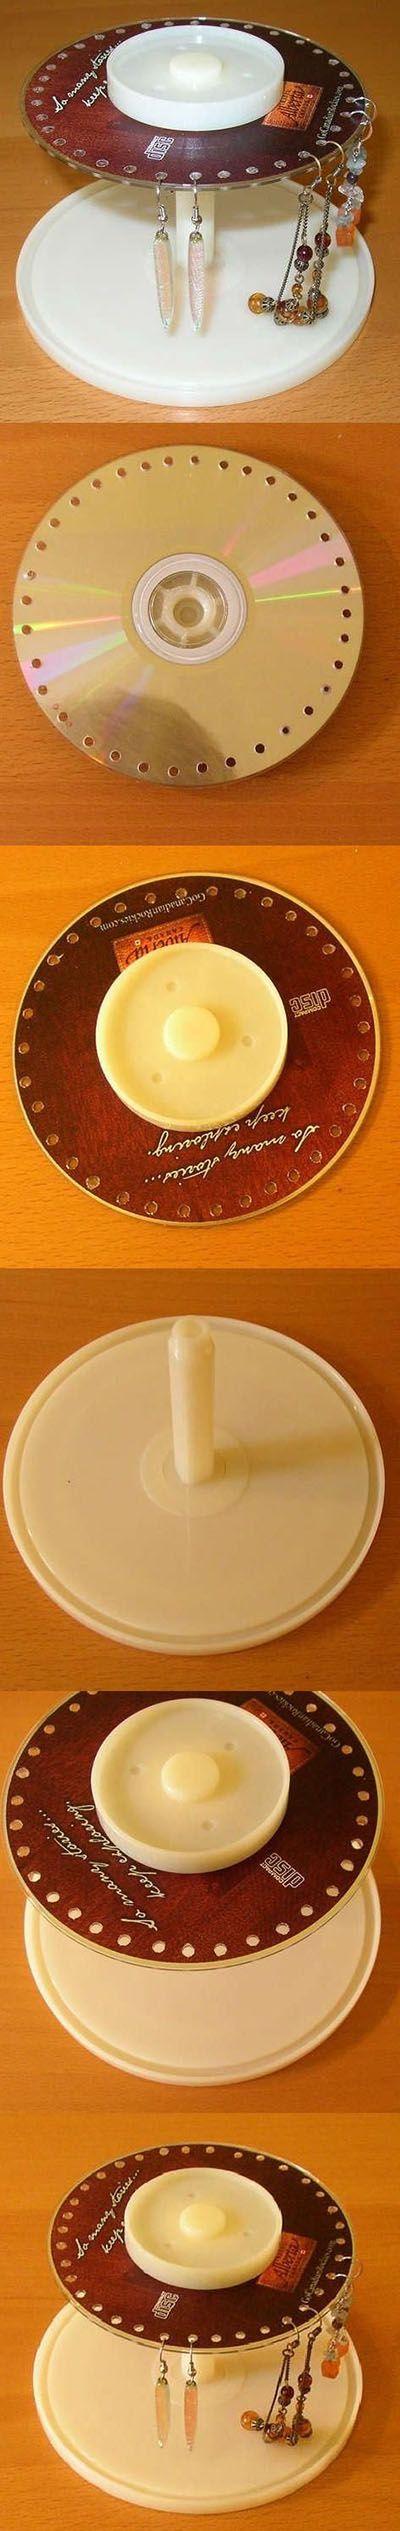 DIY Old CD Earring Stand   DIY & Crafts Tutorials